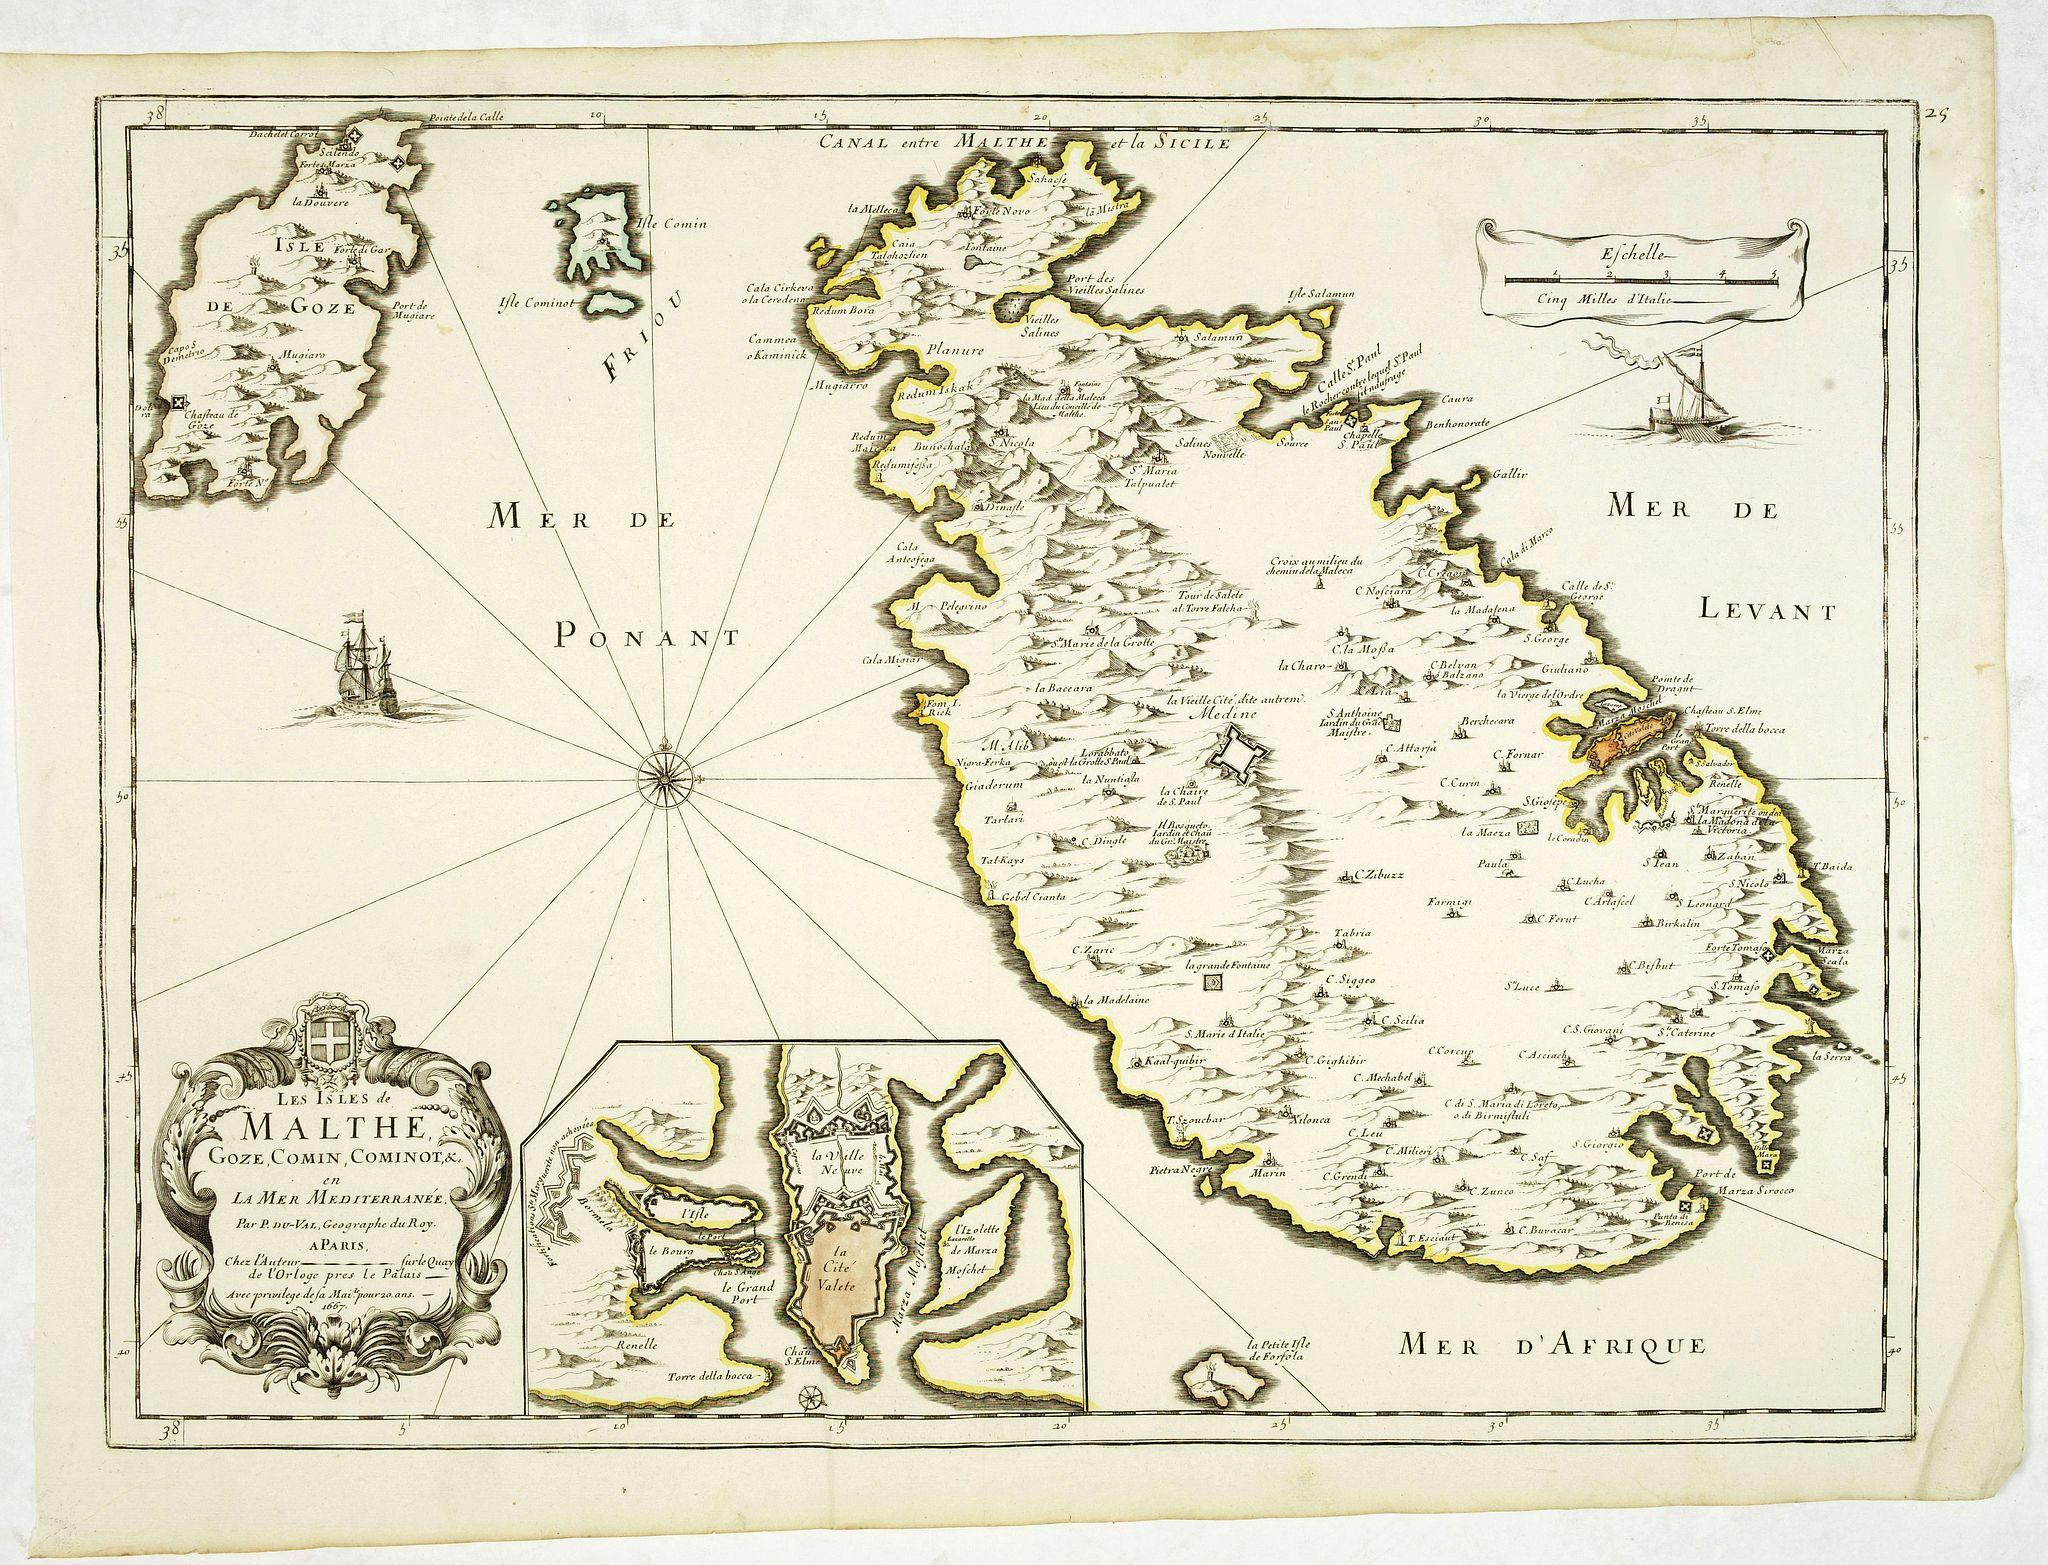 DU VAL, P. -  Les Isles de Malthe Goze, Comin, Cominot, & c. en La Mer Merditerrannée. . .